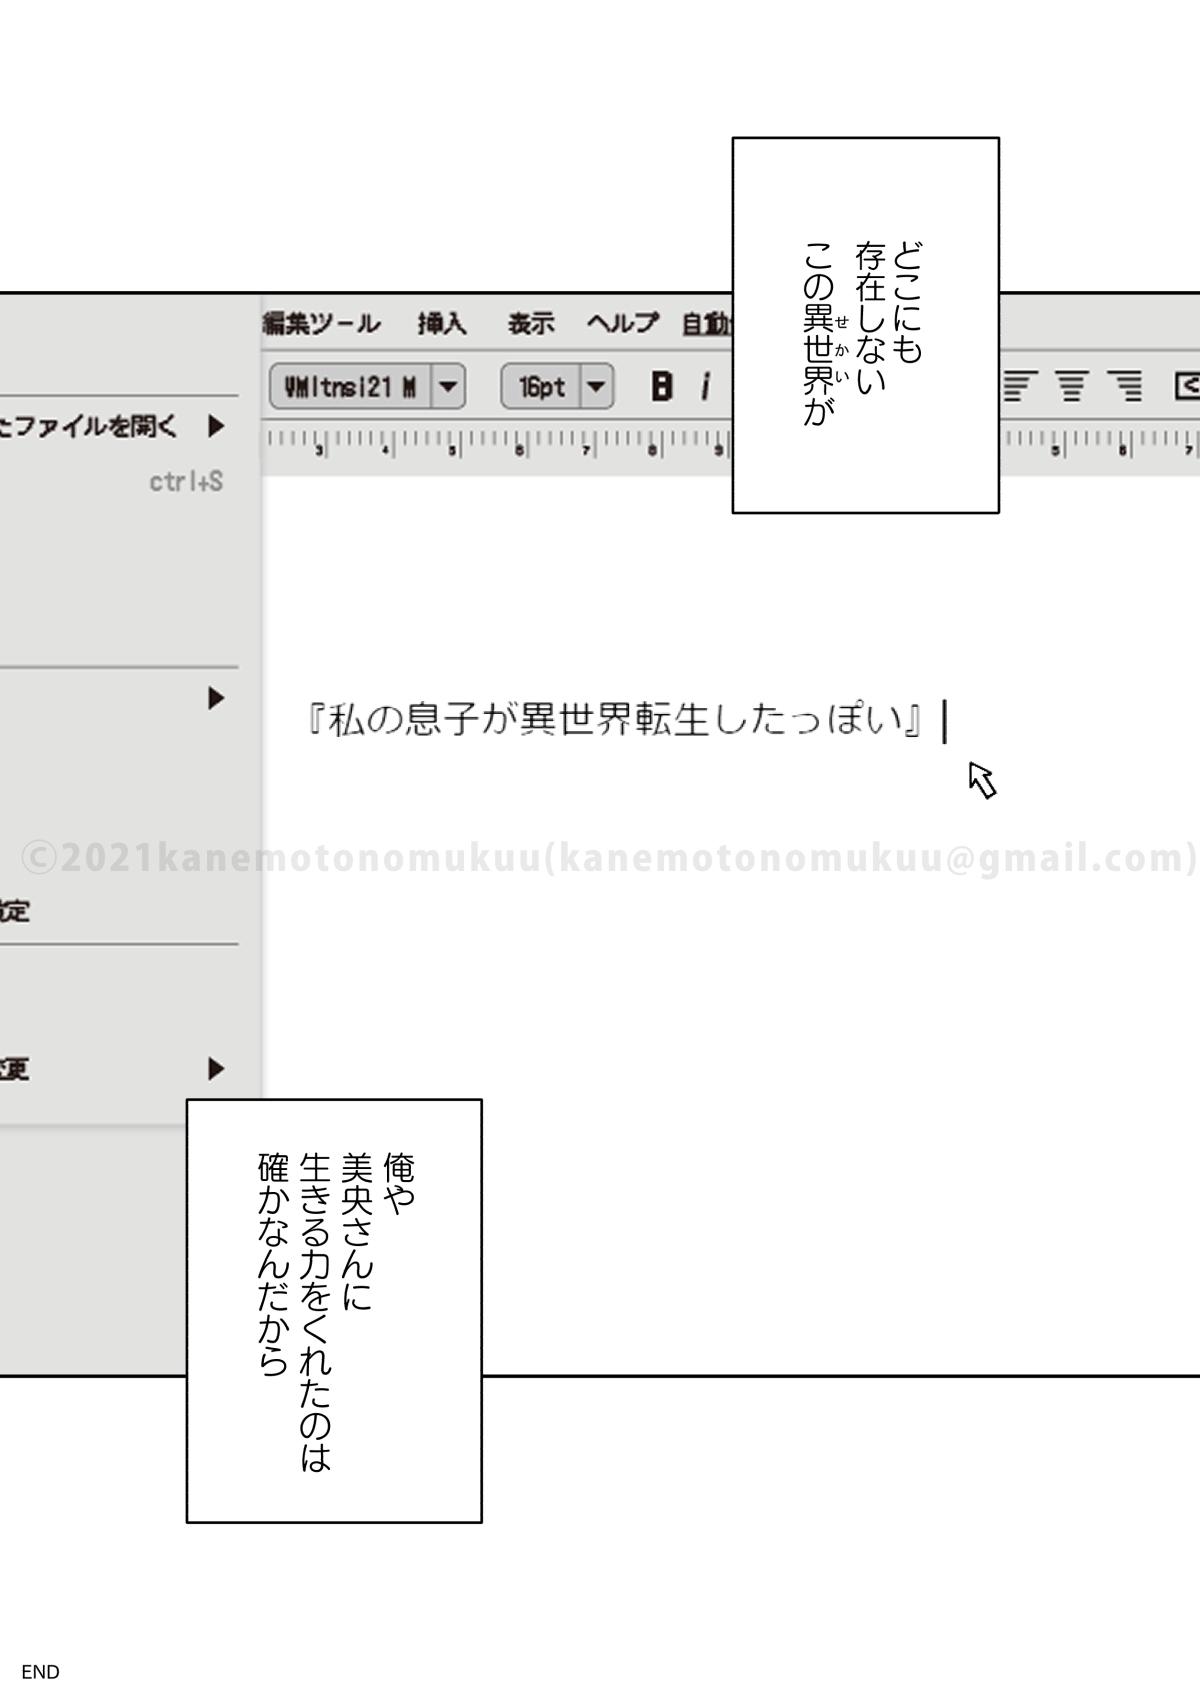 f:id:kanemotonomukuu:20210131100948j:plain